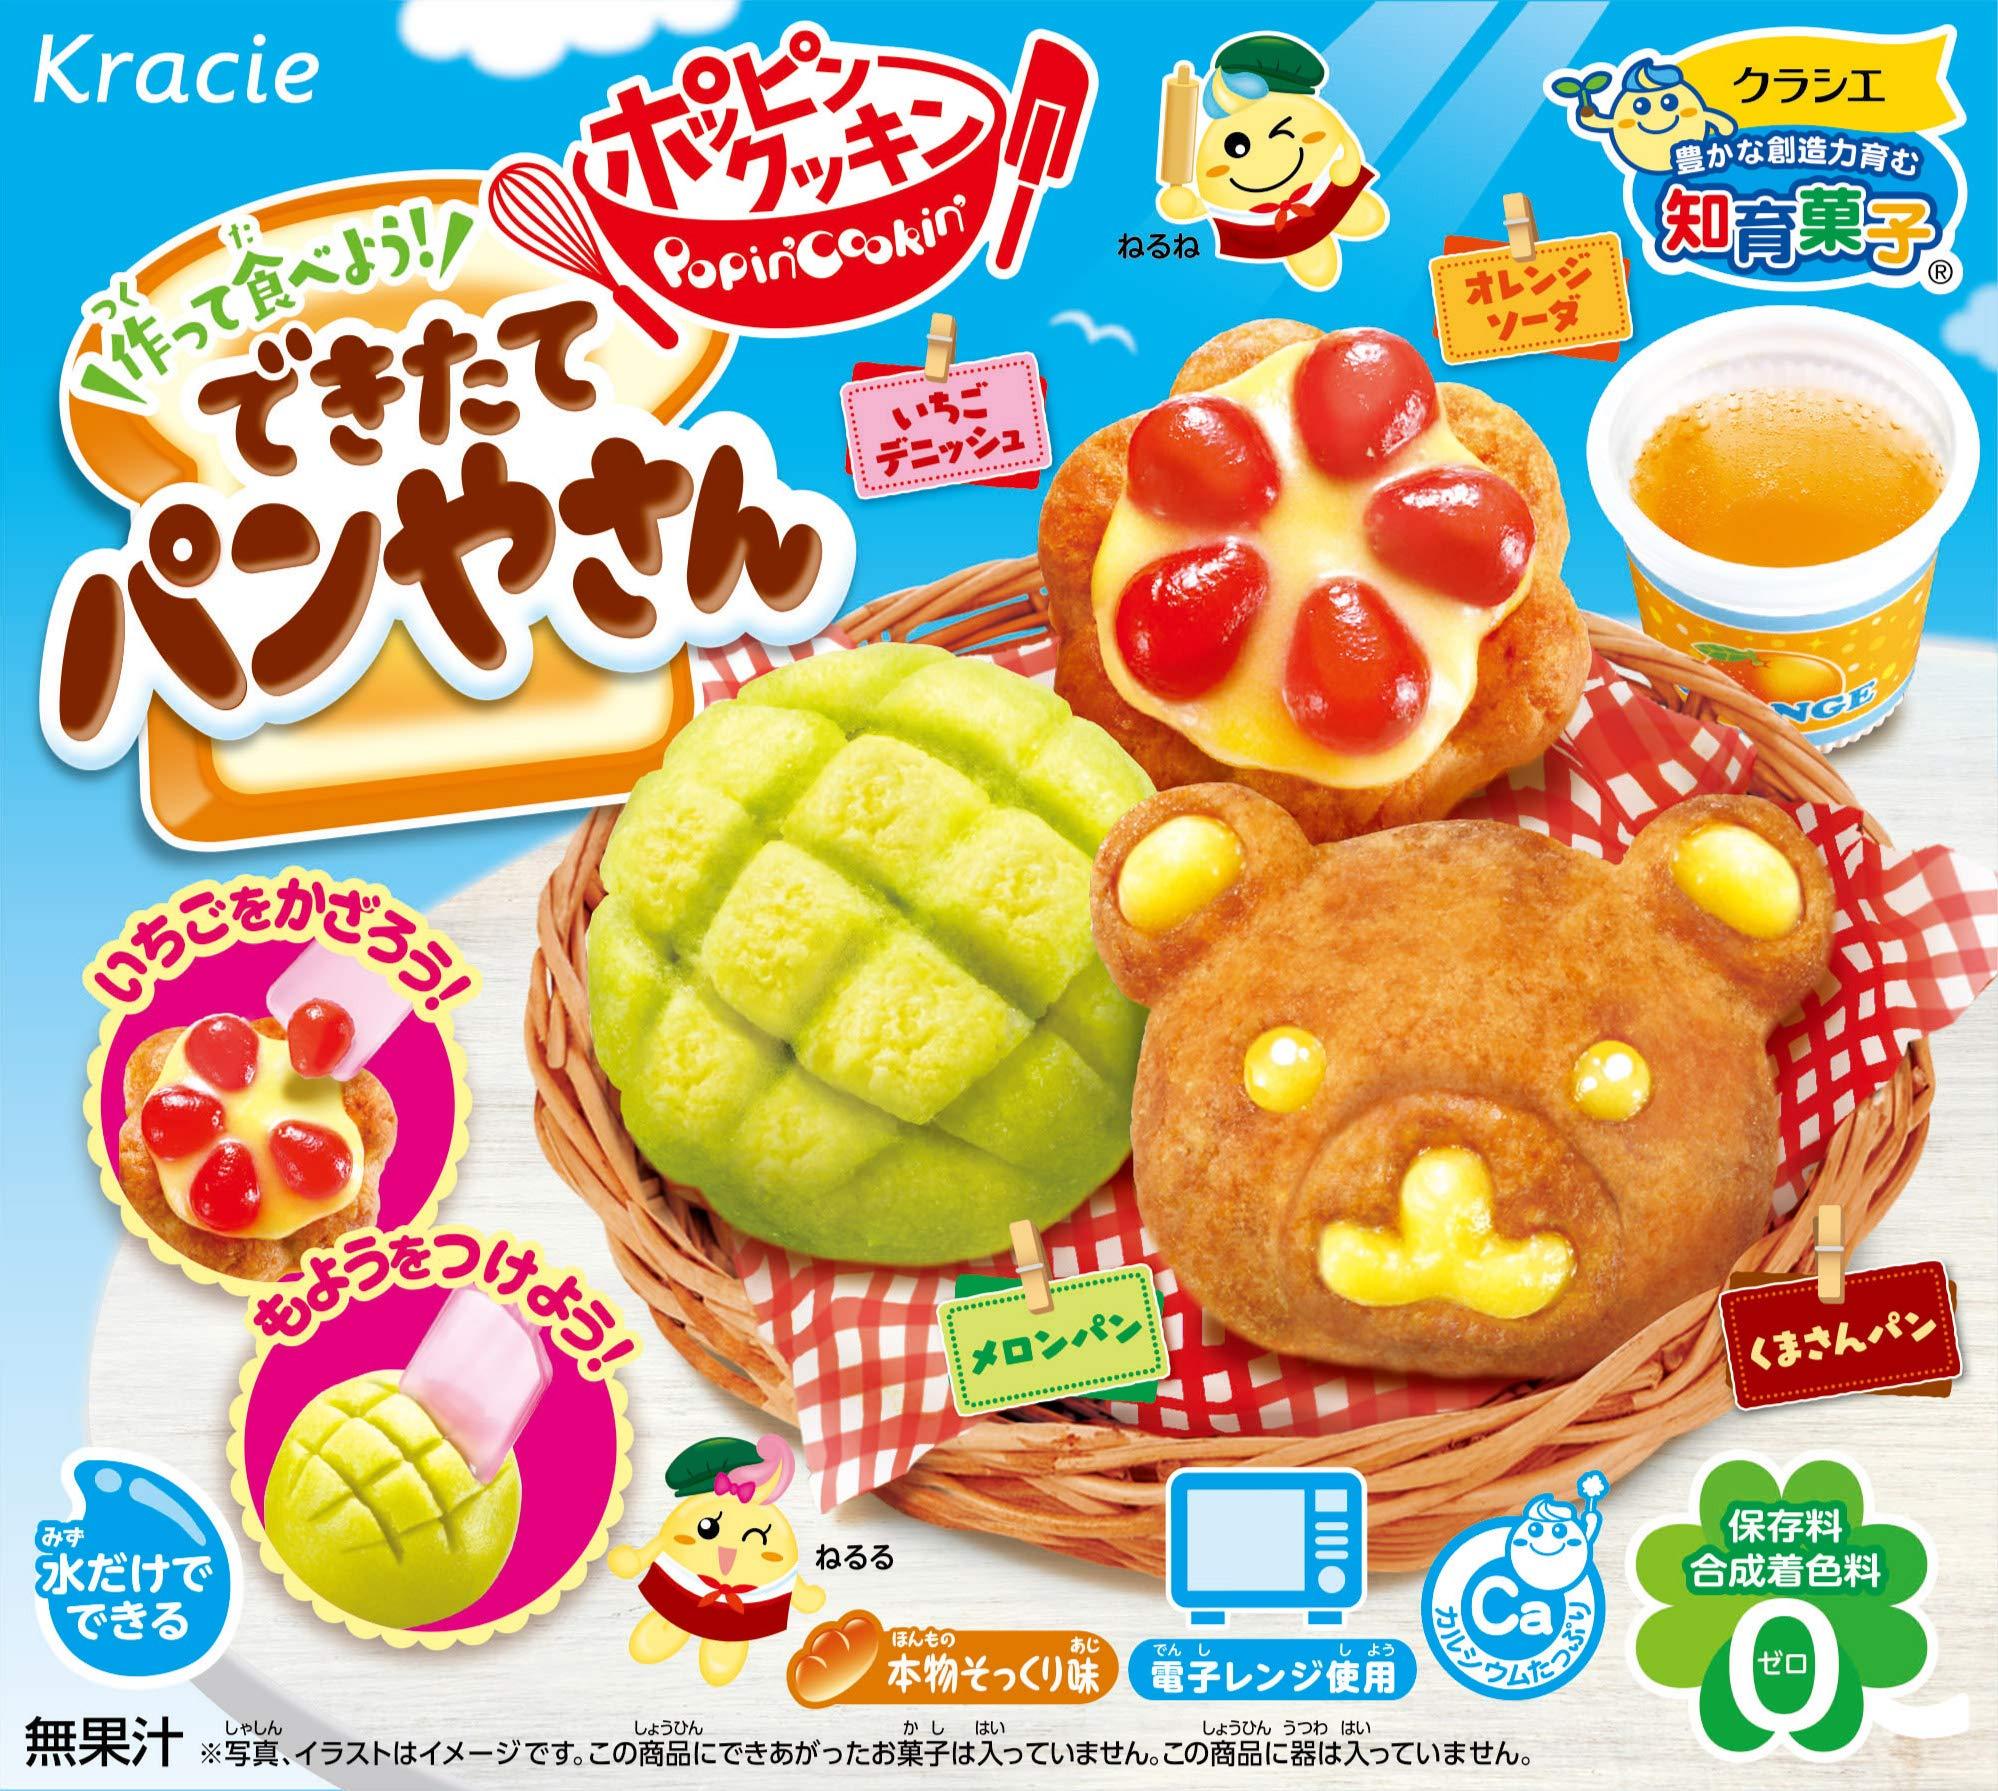 Kracie Popin Cookin Enjoy Bakery Dagashi Snack Japan